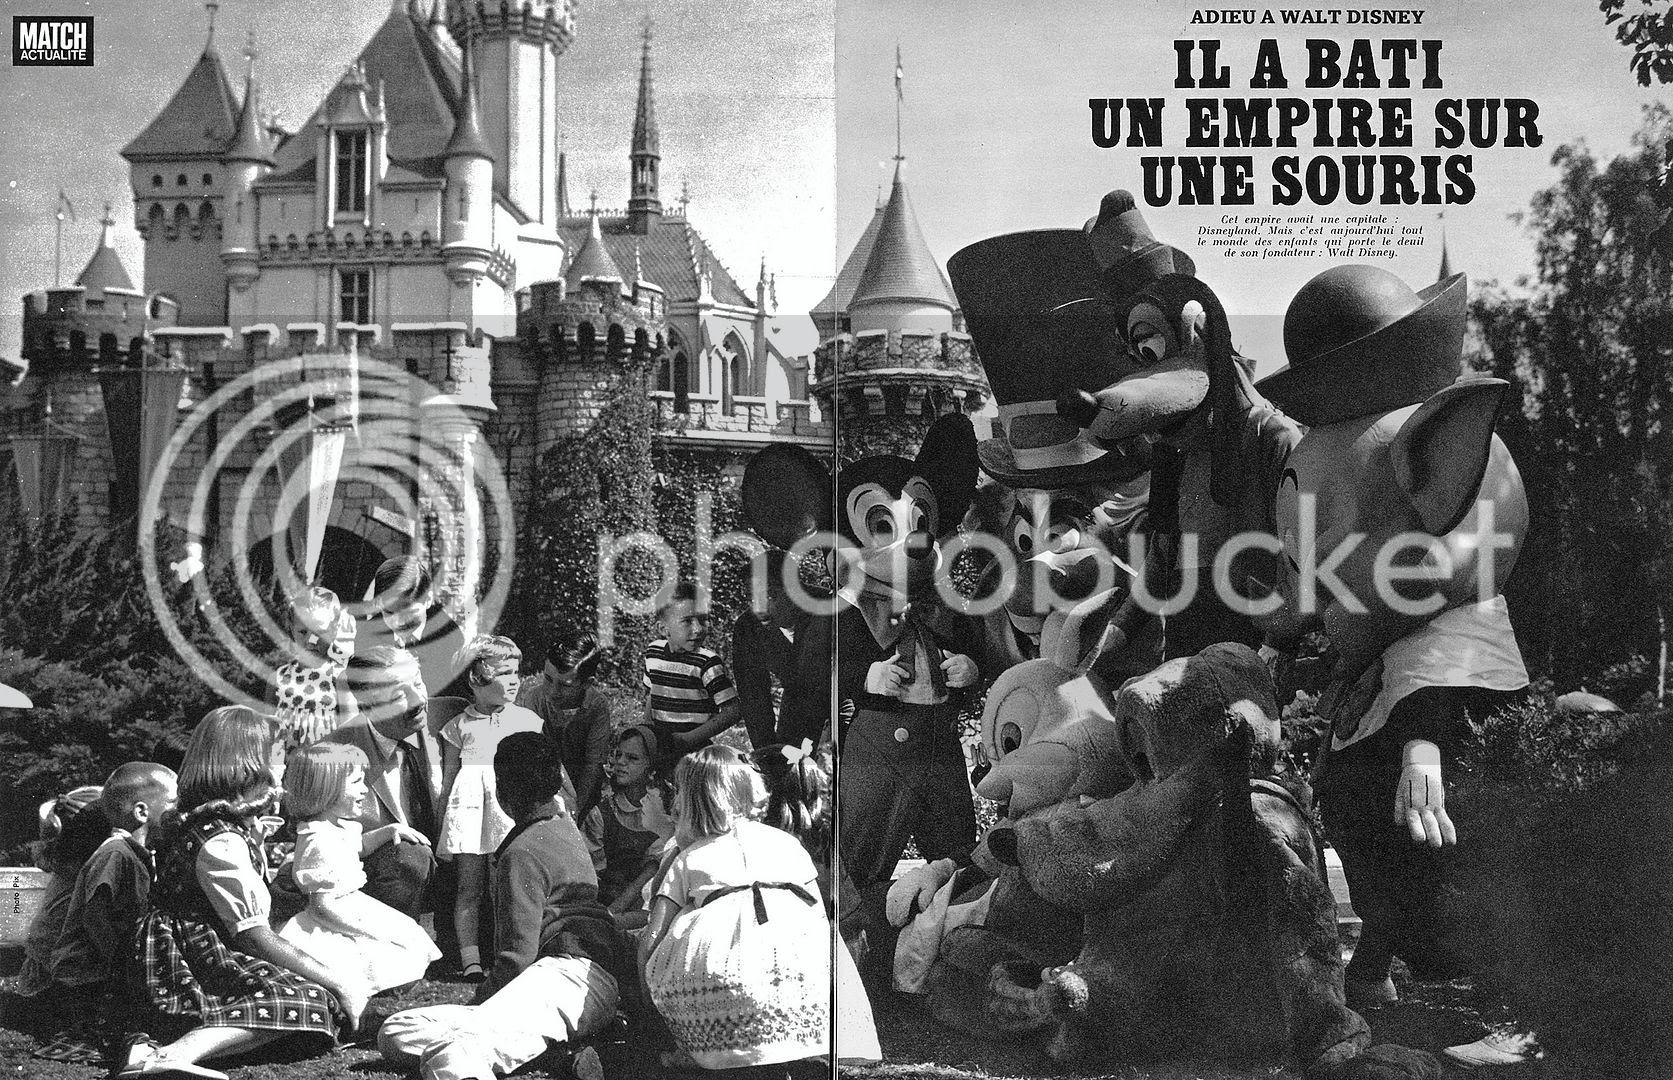 Disney And More 48 Years Ago Walt Disney Passed Away At 65 1966